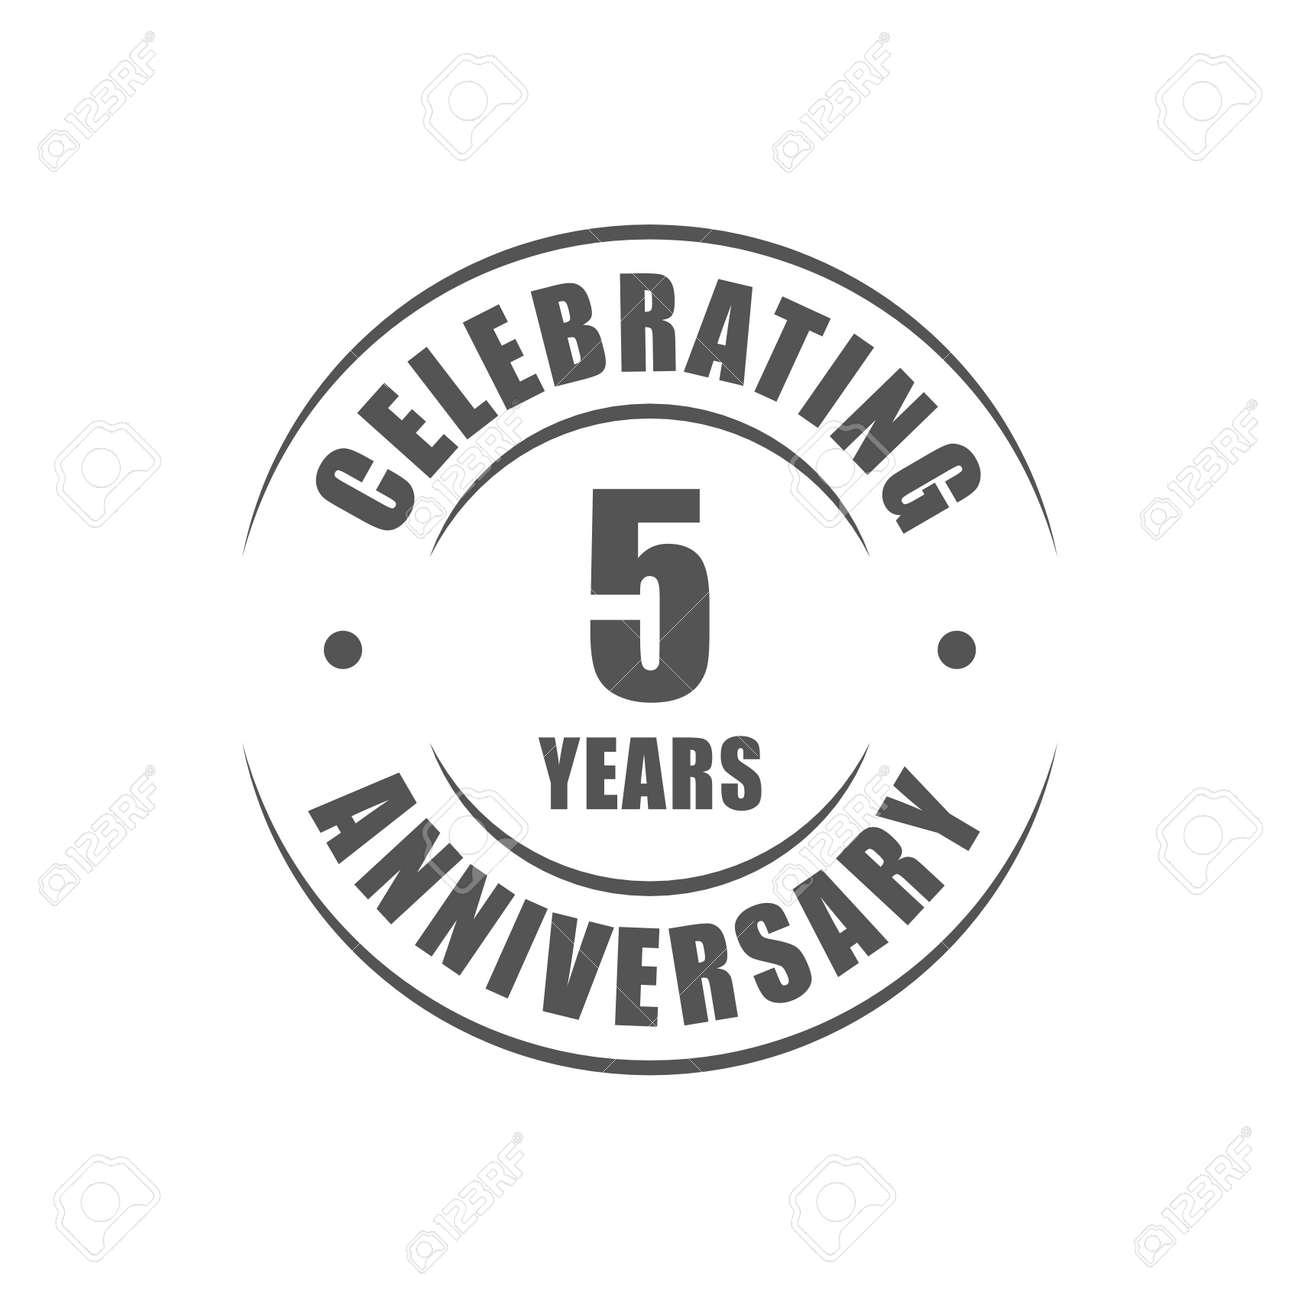 5 years celebrating anniversary logo royalty free cliparts 5 years celebrating anniversary logo stock vector 64660732 biocorpaavc Choice Image